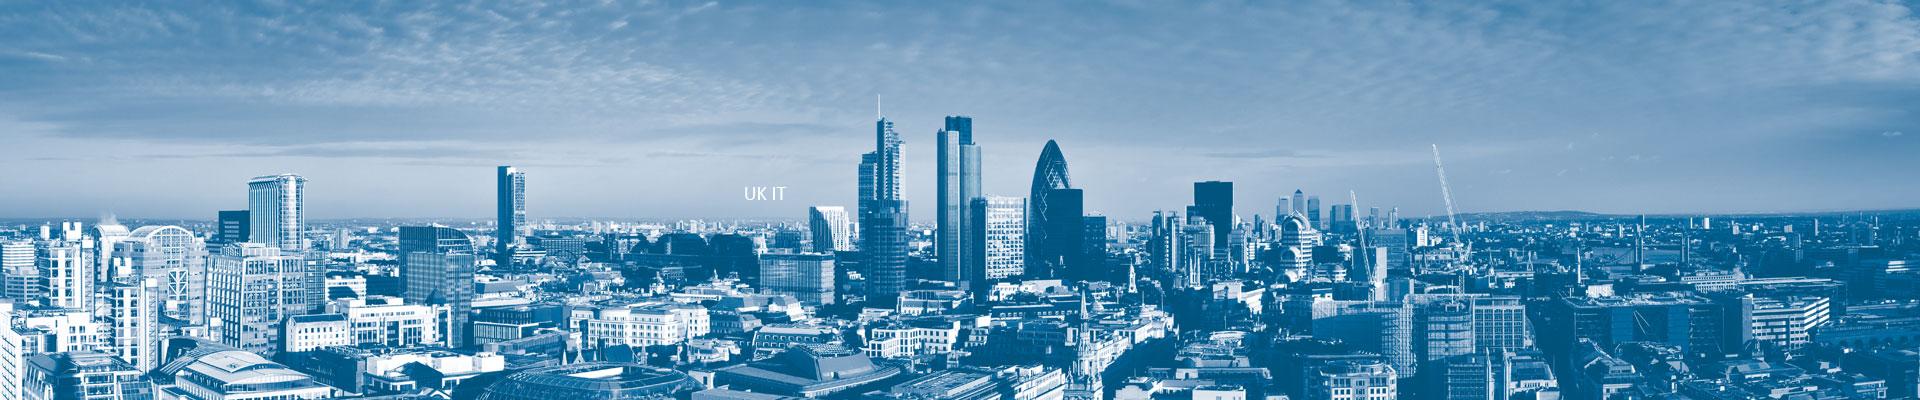 UK IT provider